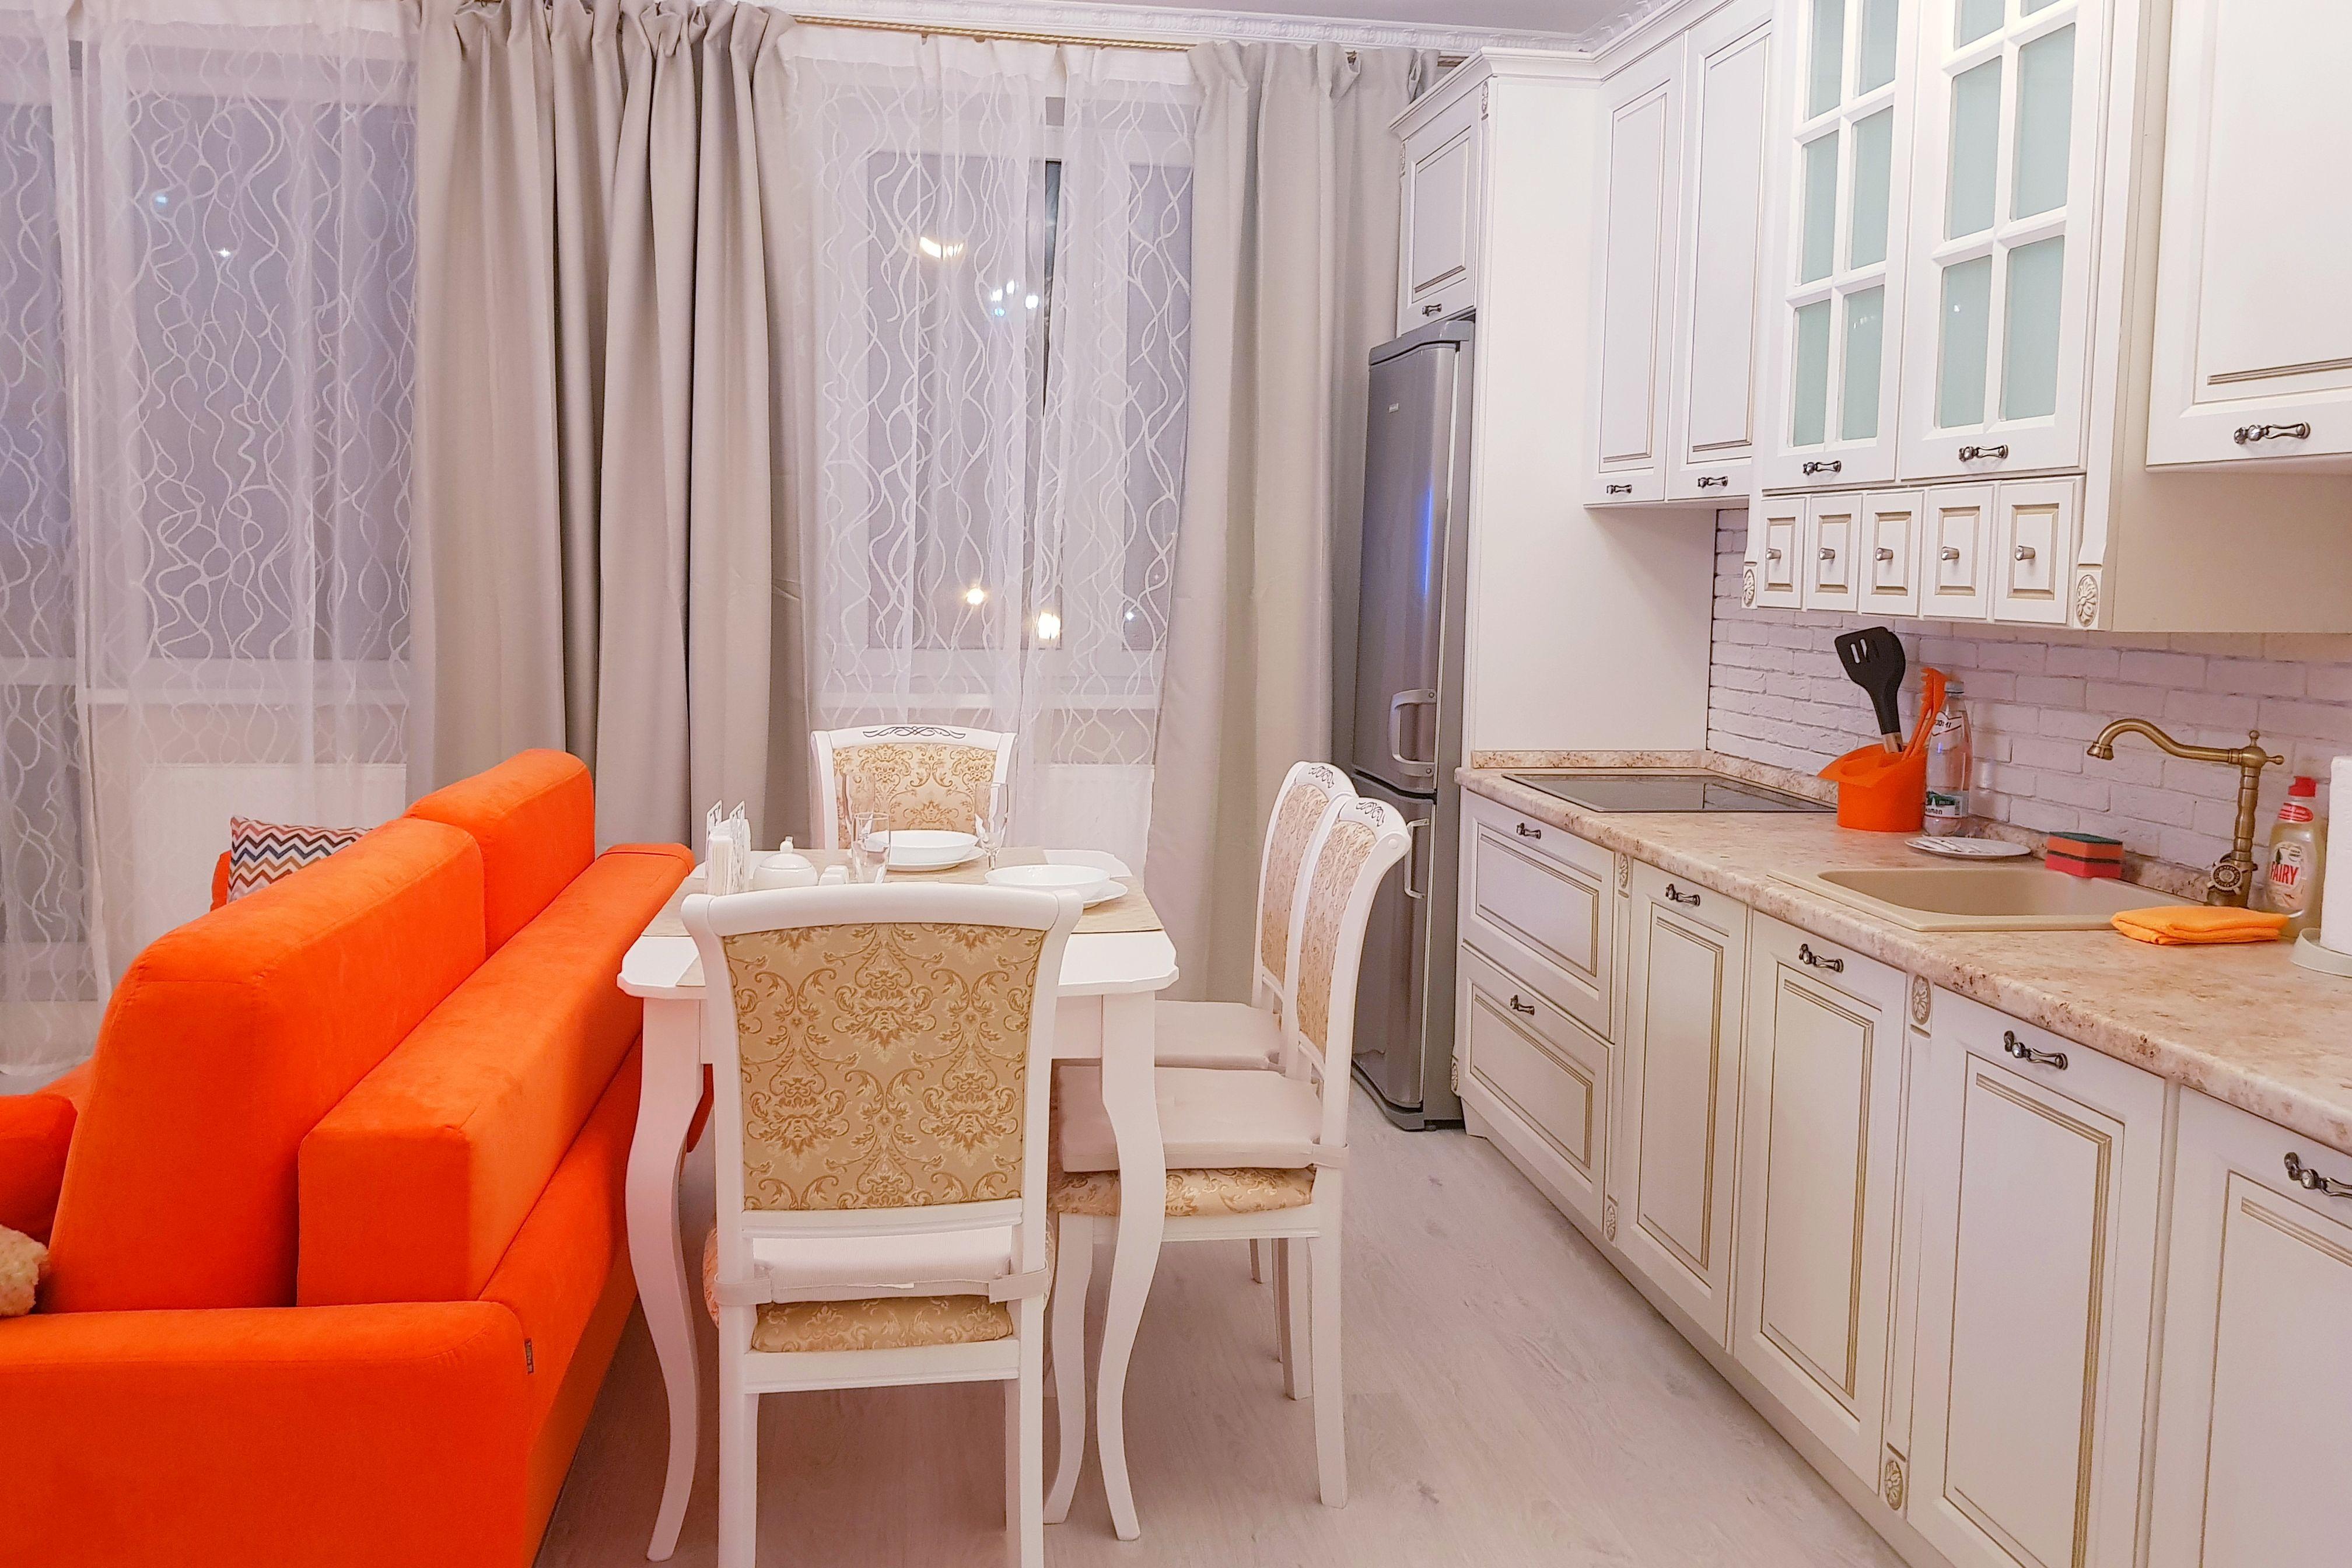 Казань, улица Алексея Козина, 3А - 2-ком. Квартира - аренда посуточно в Казани #10104